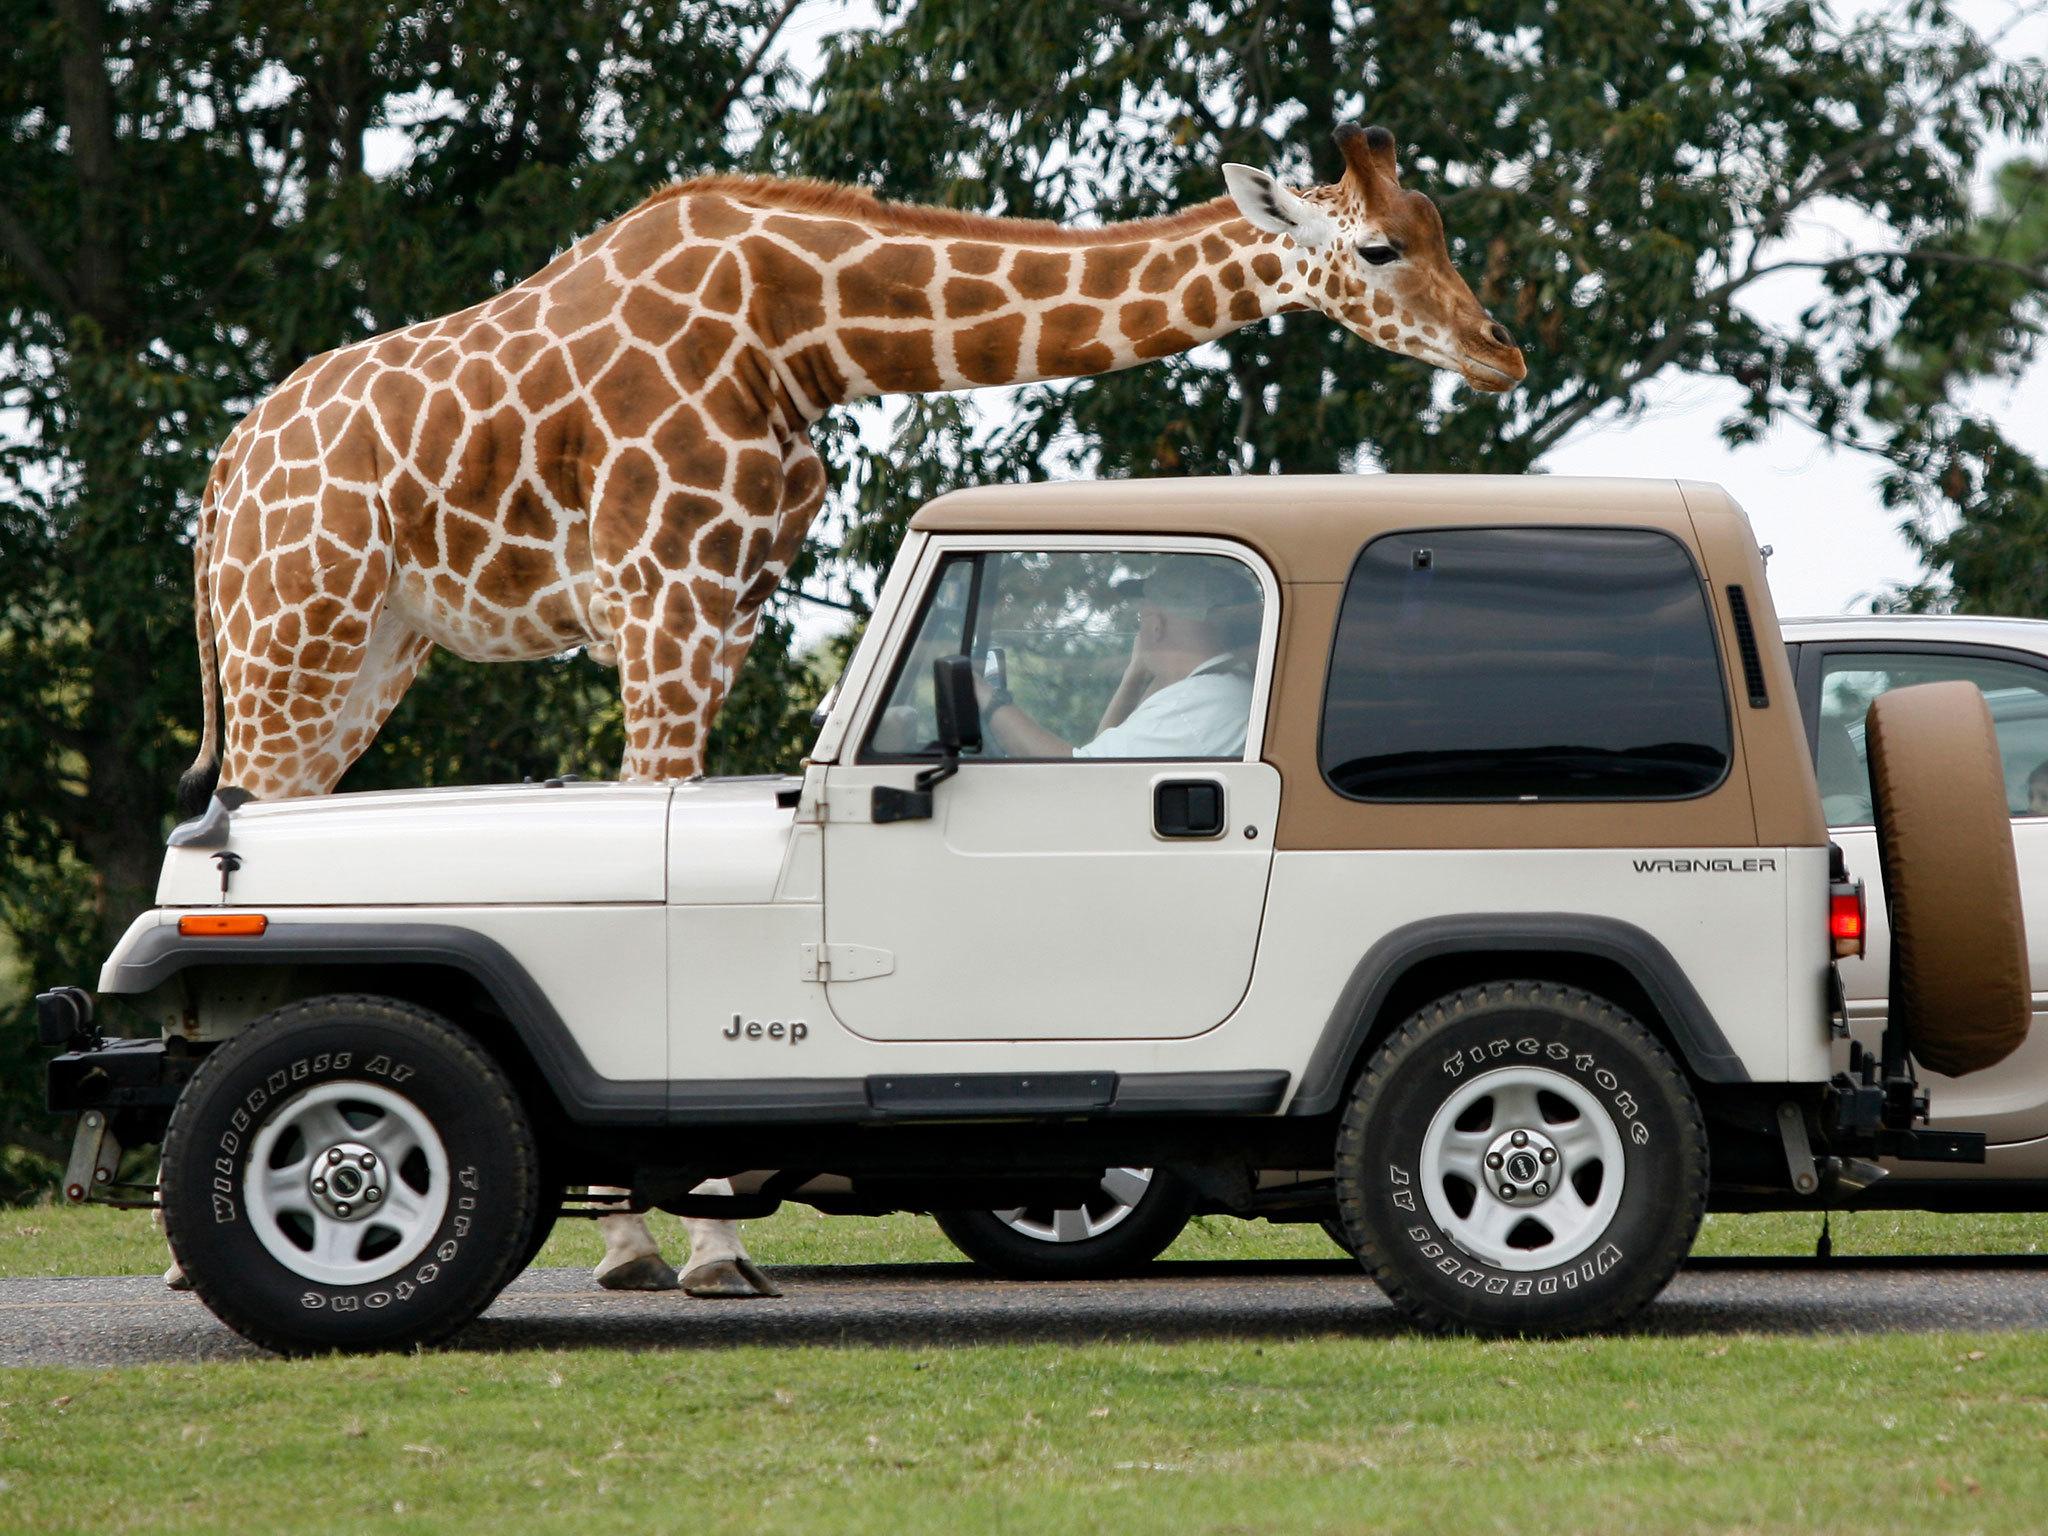 Six Flags' Safari Adventure